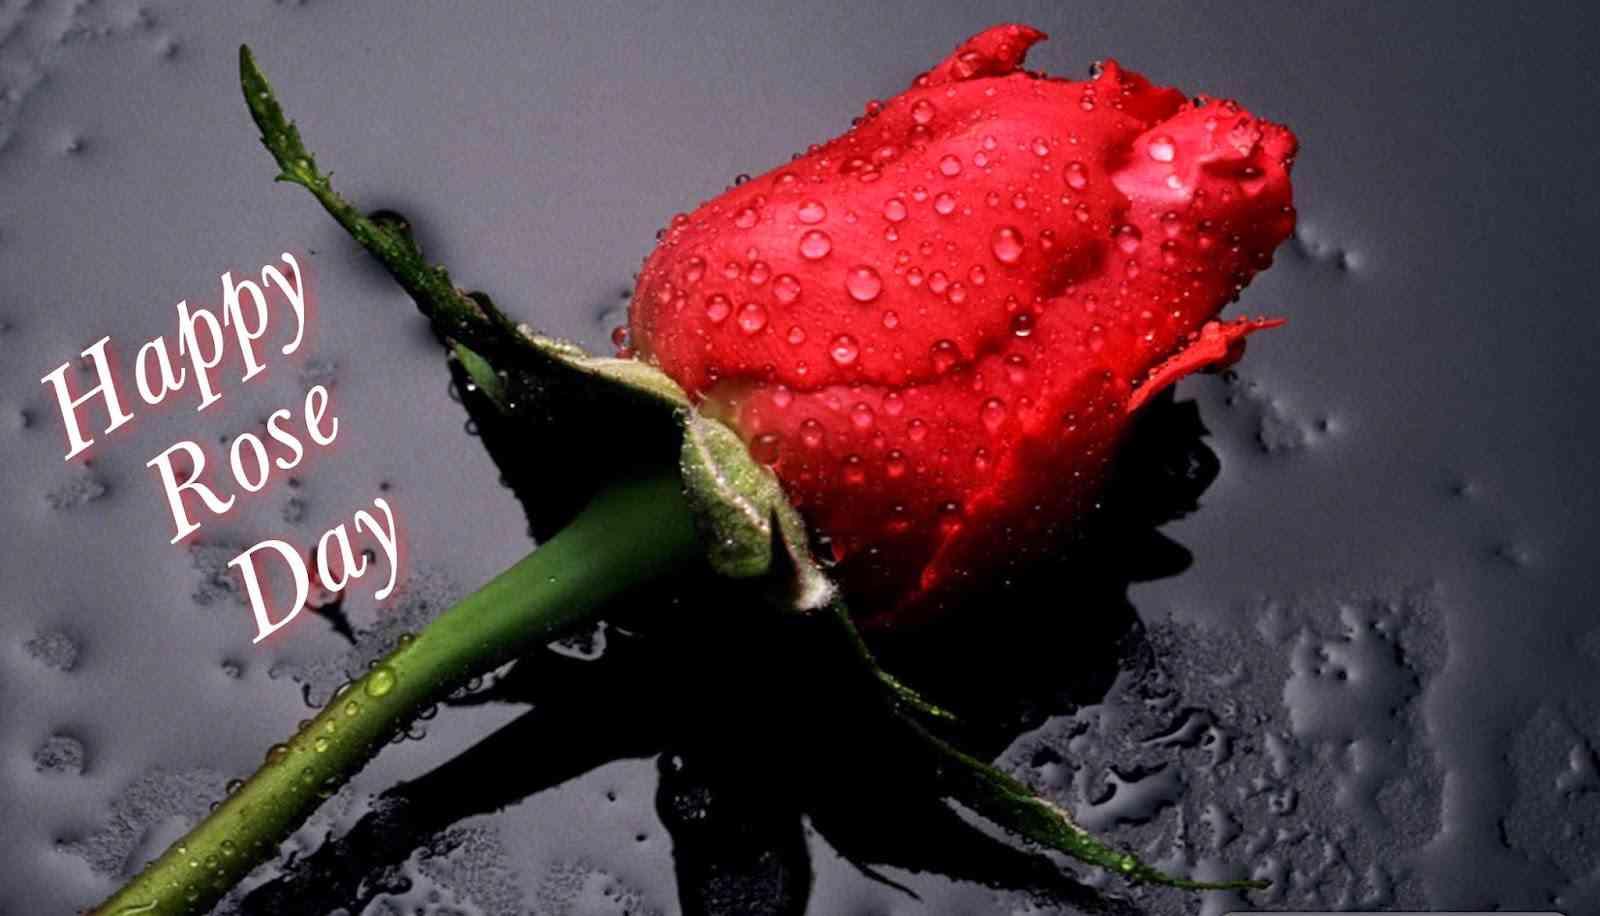 Image result for rose day best image